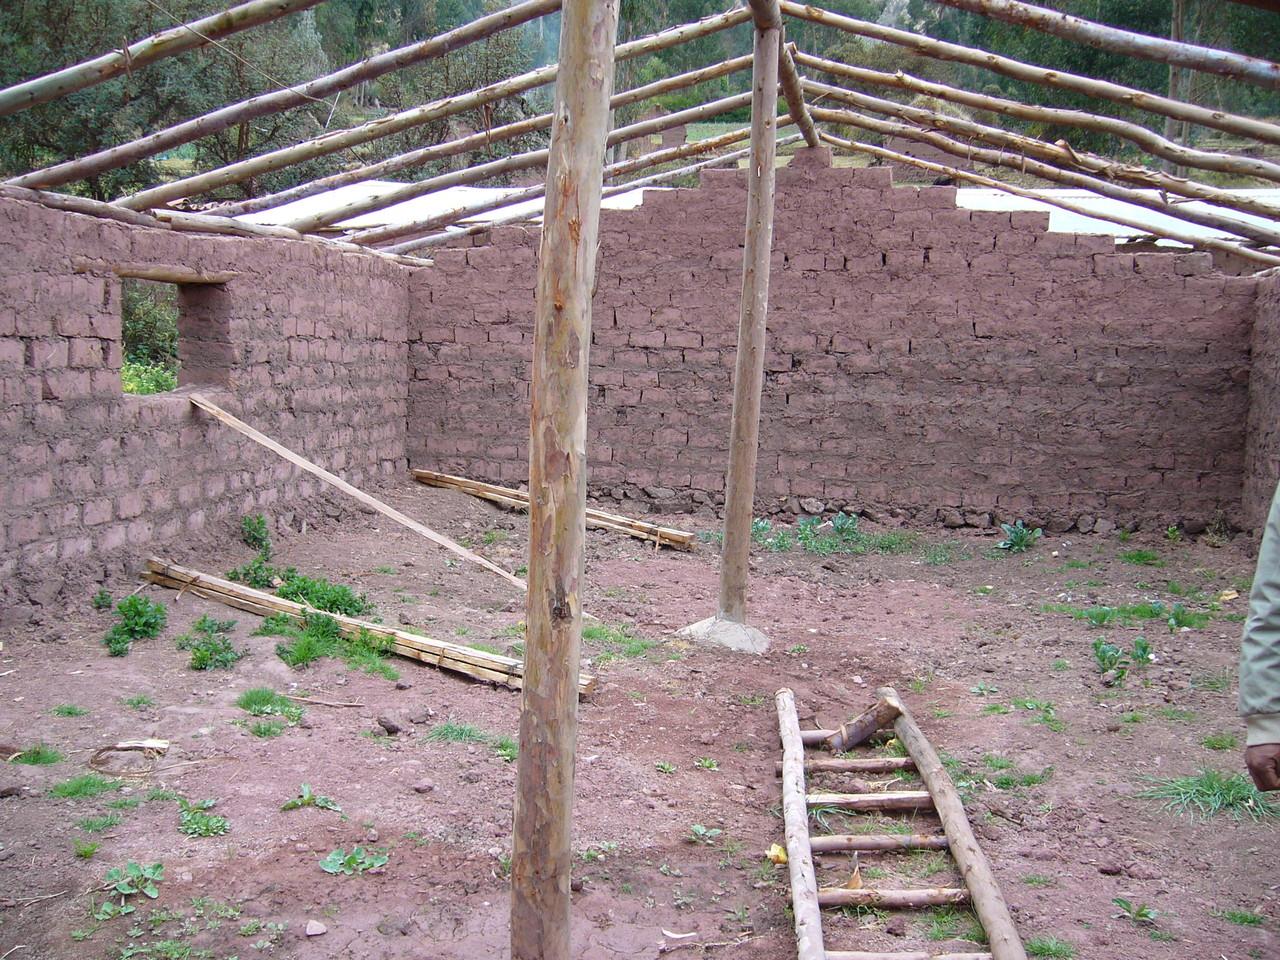 Biohuerto en construcción – Matinga